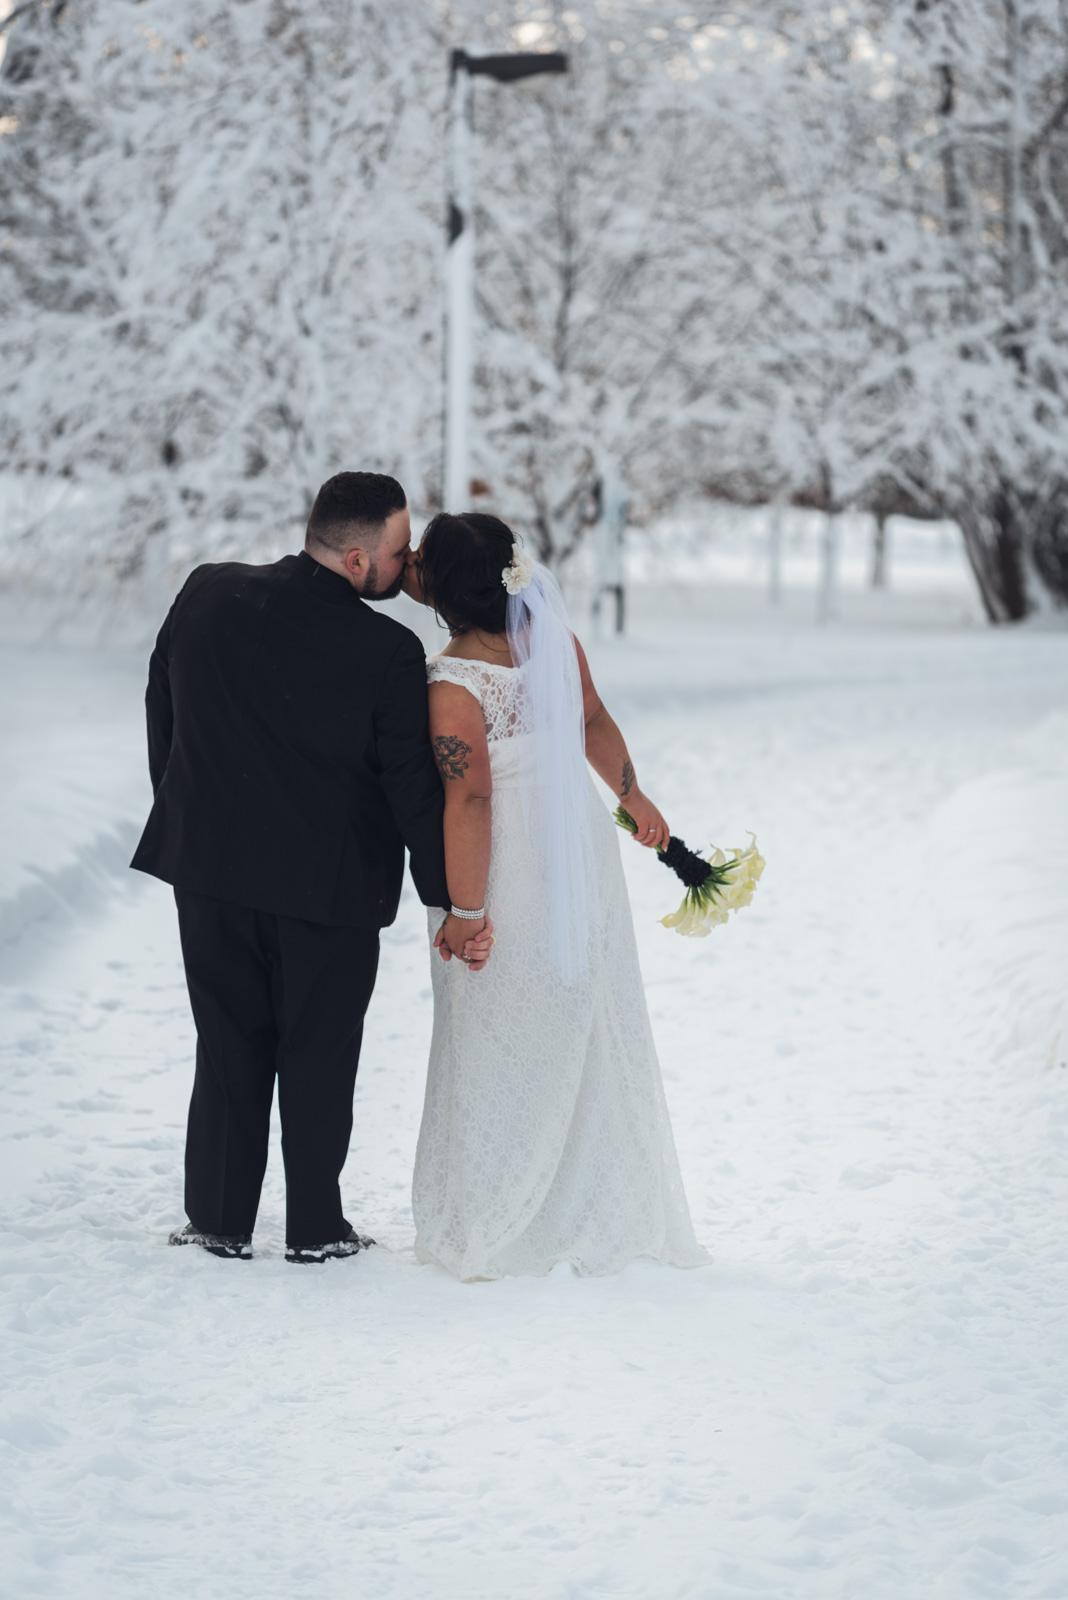 rheana-chris-wedding-blog-173.jpg